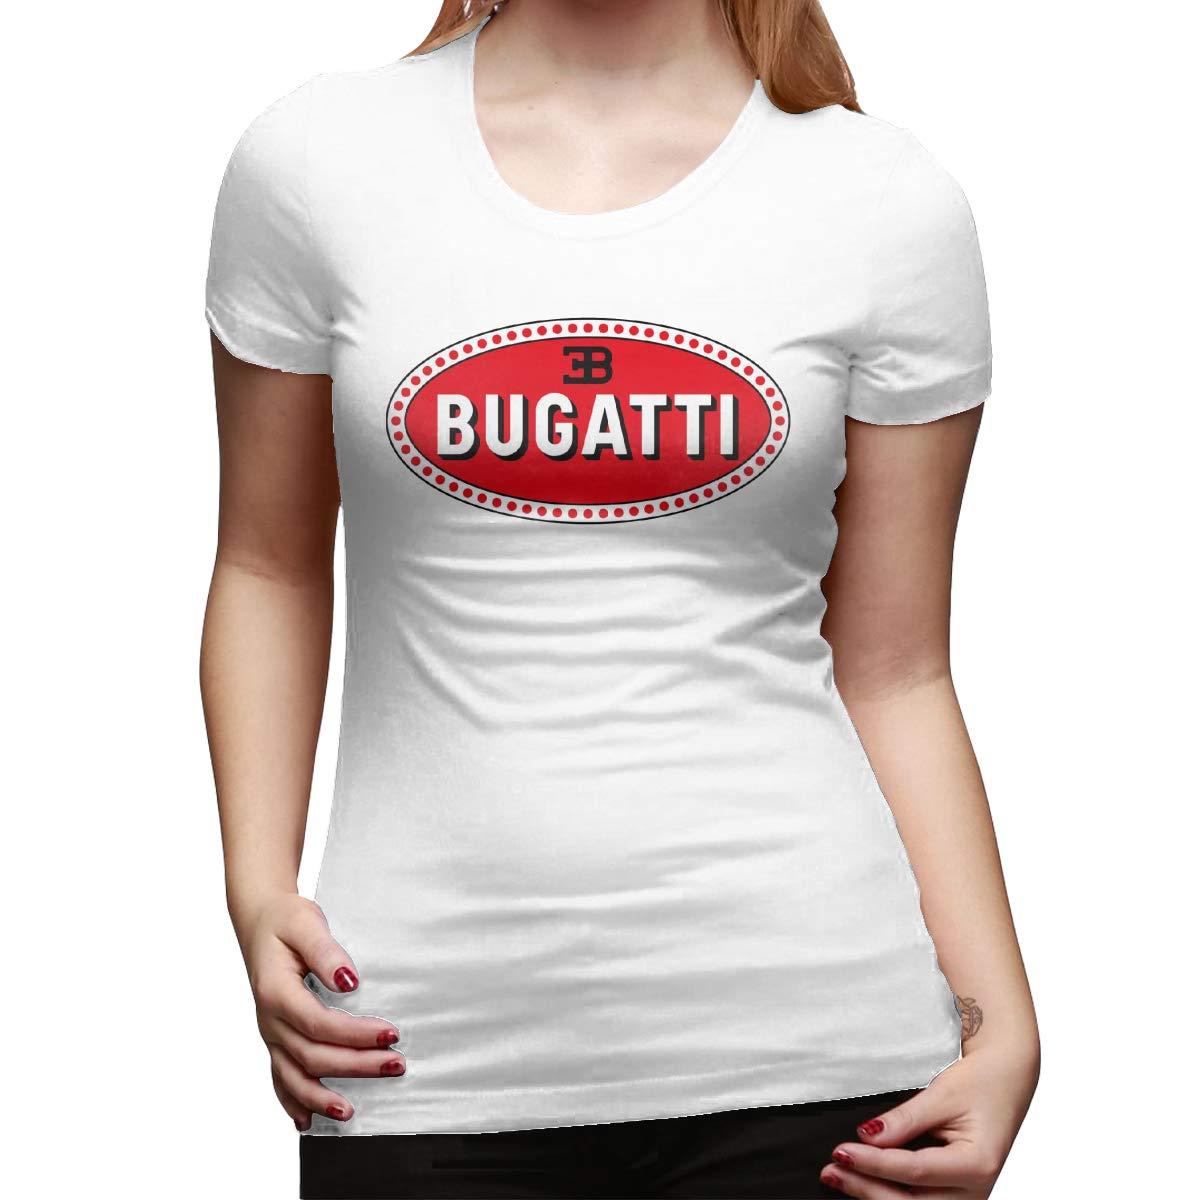 BingFeng Designed T Shirt Bugatti Car Logo 2 Short Sleeve Funny Shirt for Ladies Black